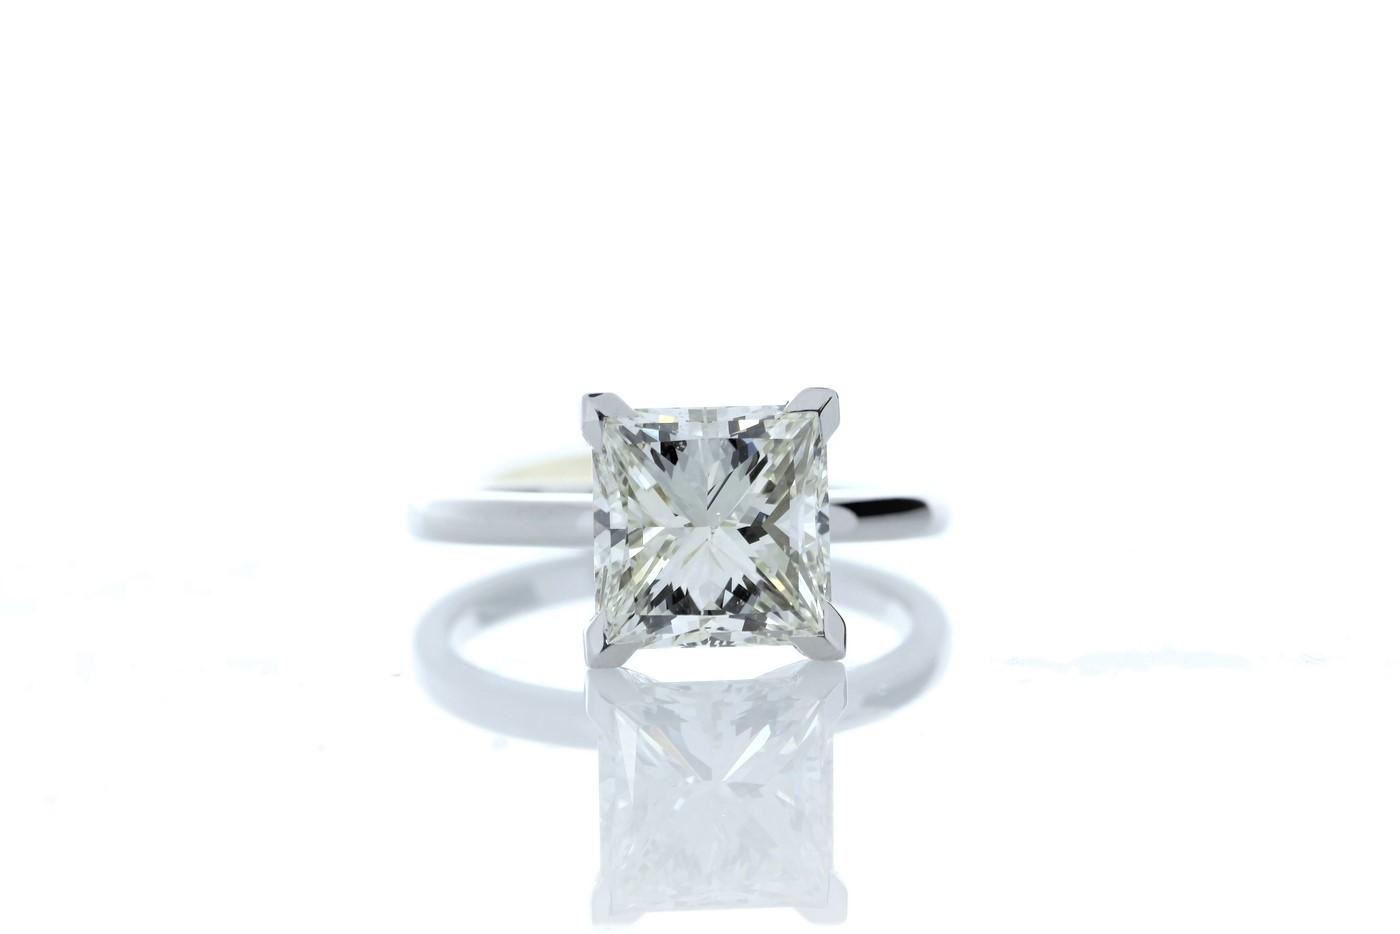 Lot 21 - 18ct White Gold Princess Cut Diamond Ring 3.09 Carats